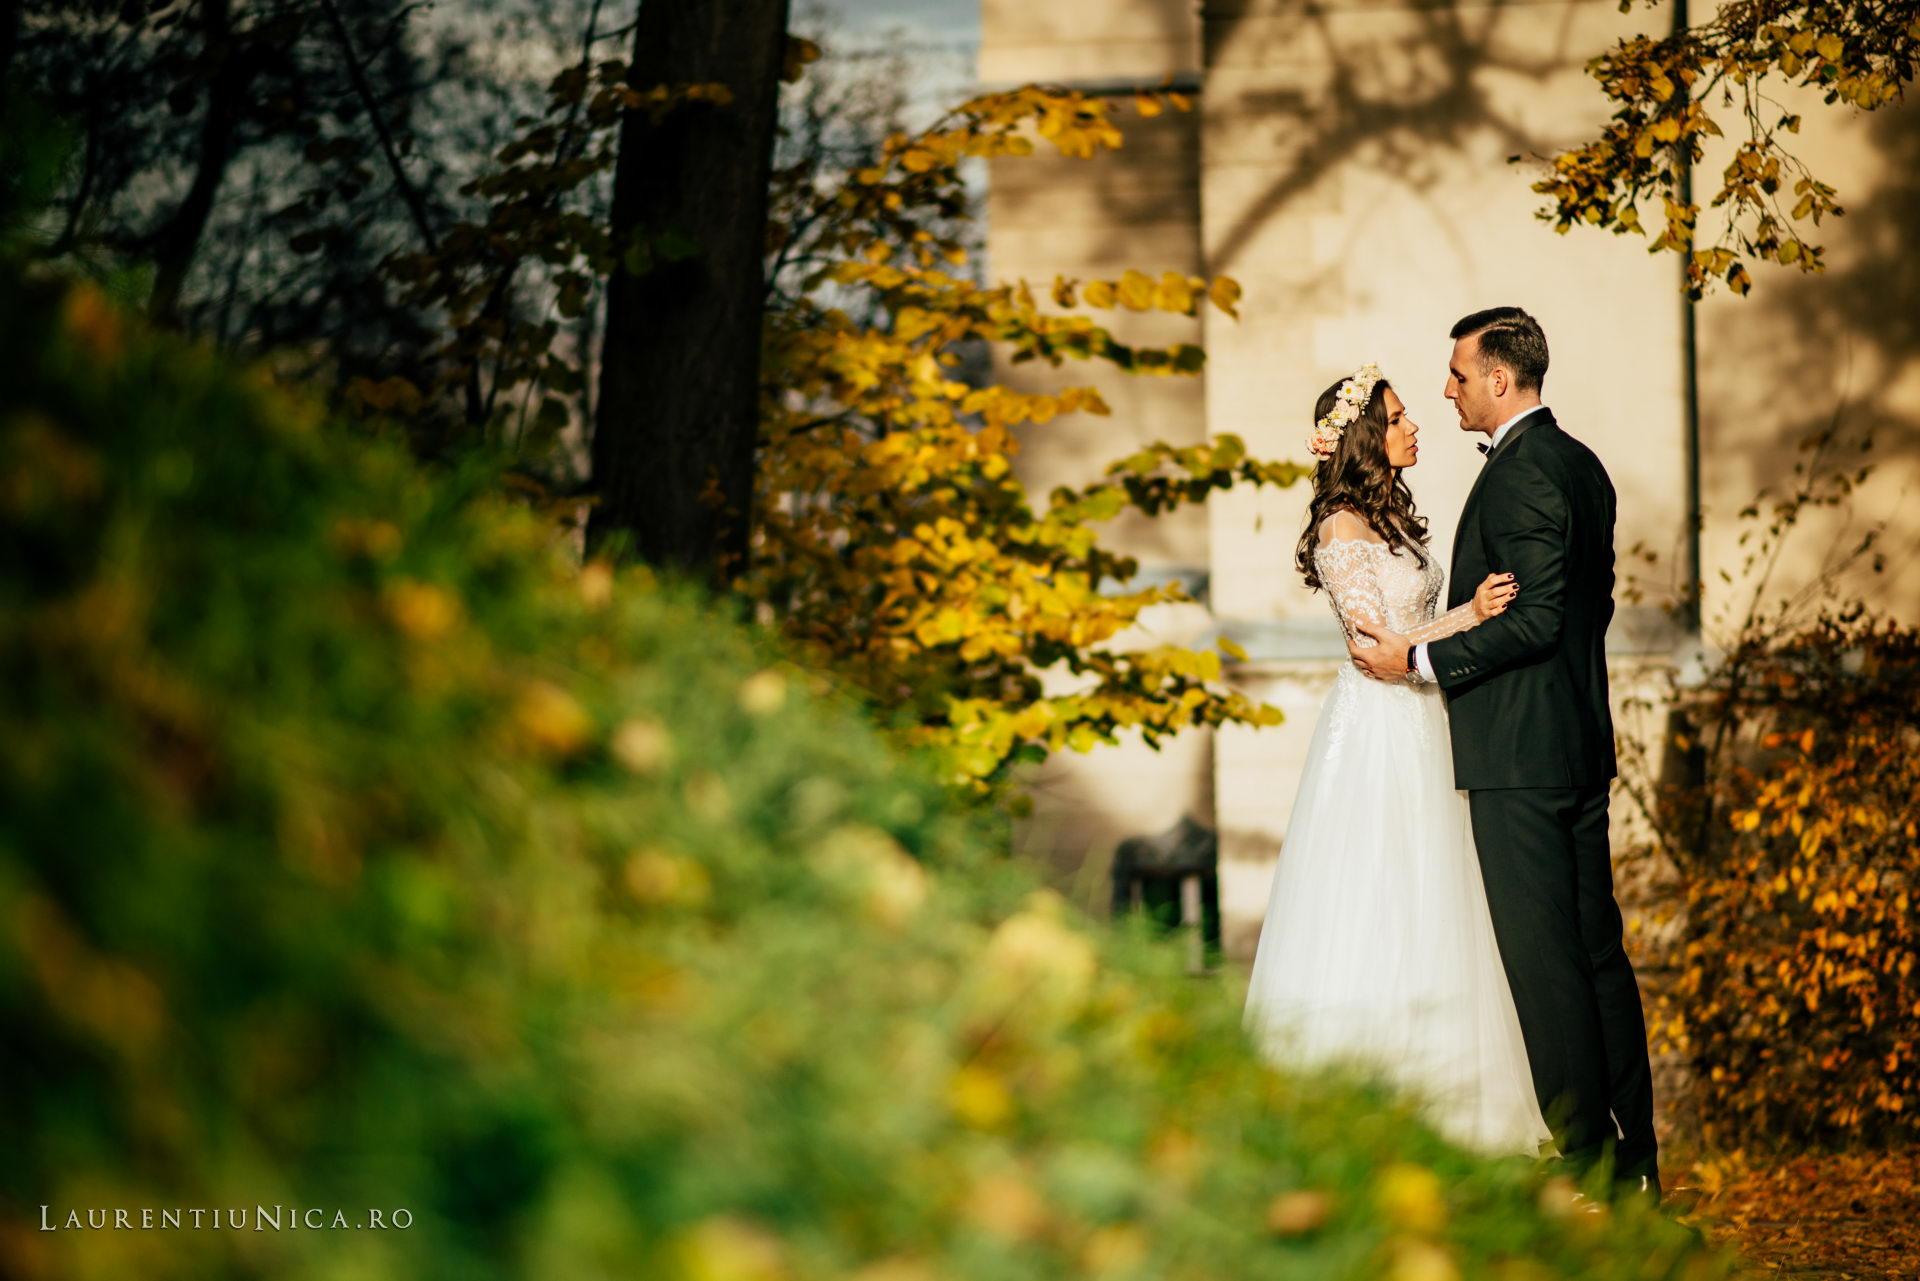 lili-si-dan-fotografii-nunta-after-wedding-sighisoara-laurentiu-nica30